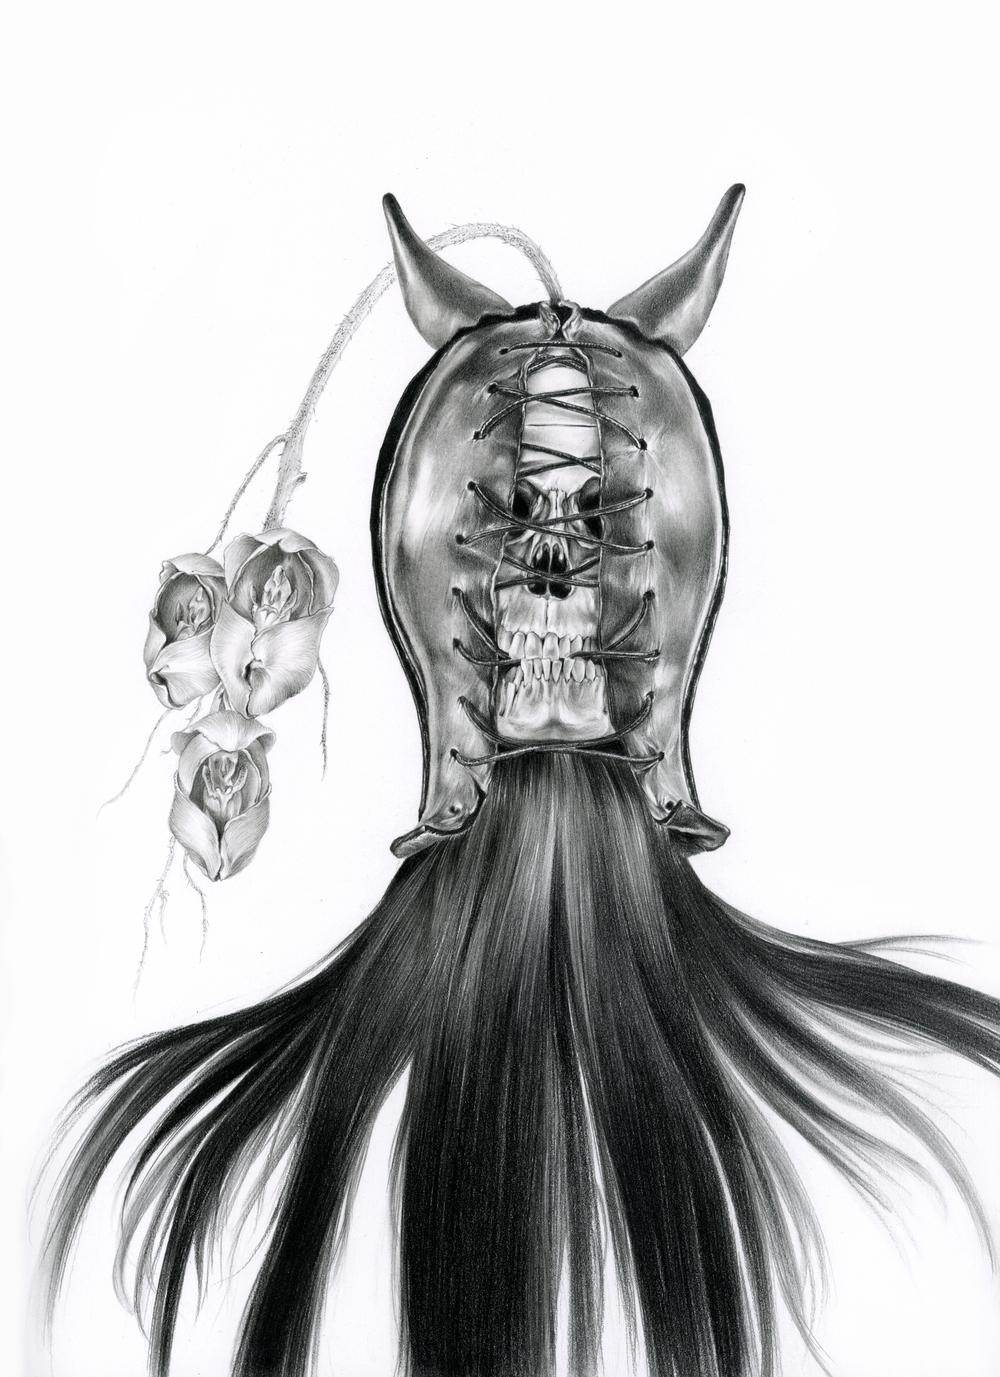 "Karen Hsiao, 'Biter', 11"" x 17"", Graphite on Vellum"